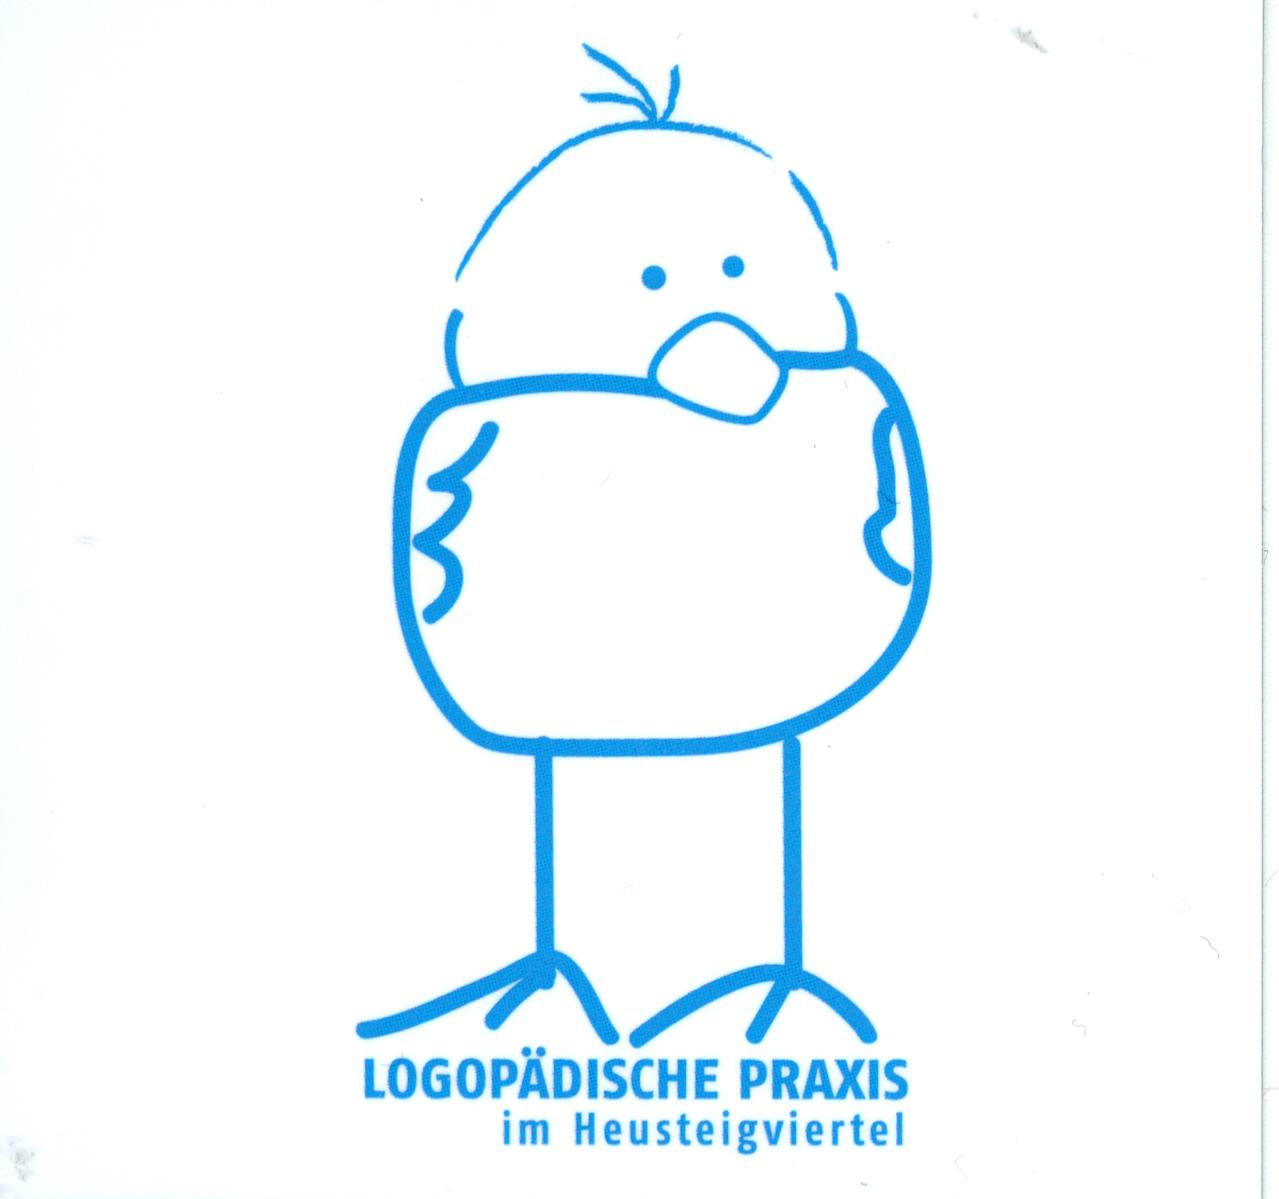 Logopädische Praxis im Heusteigviertel A. Makowka